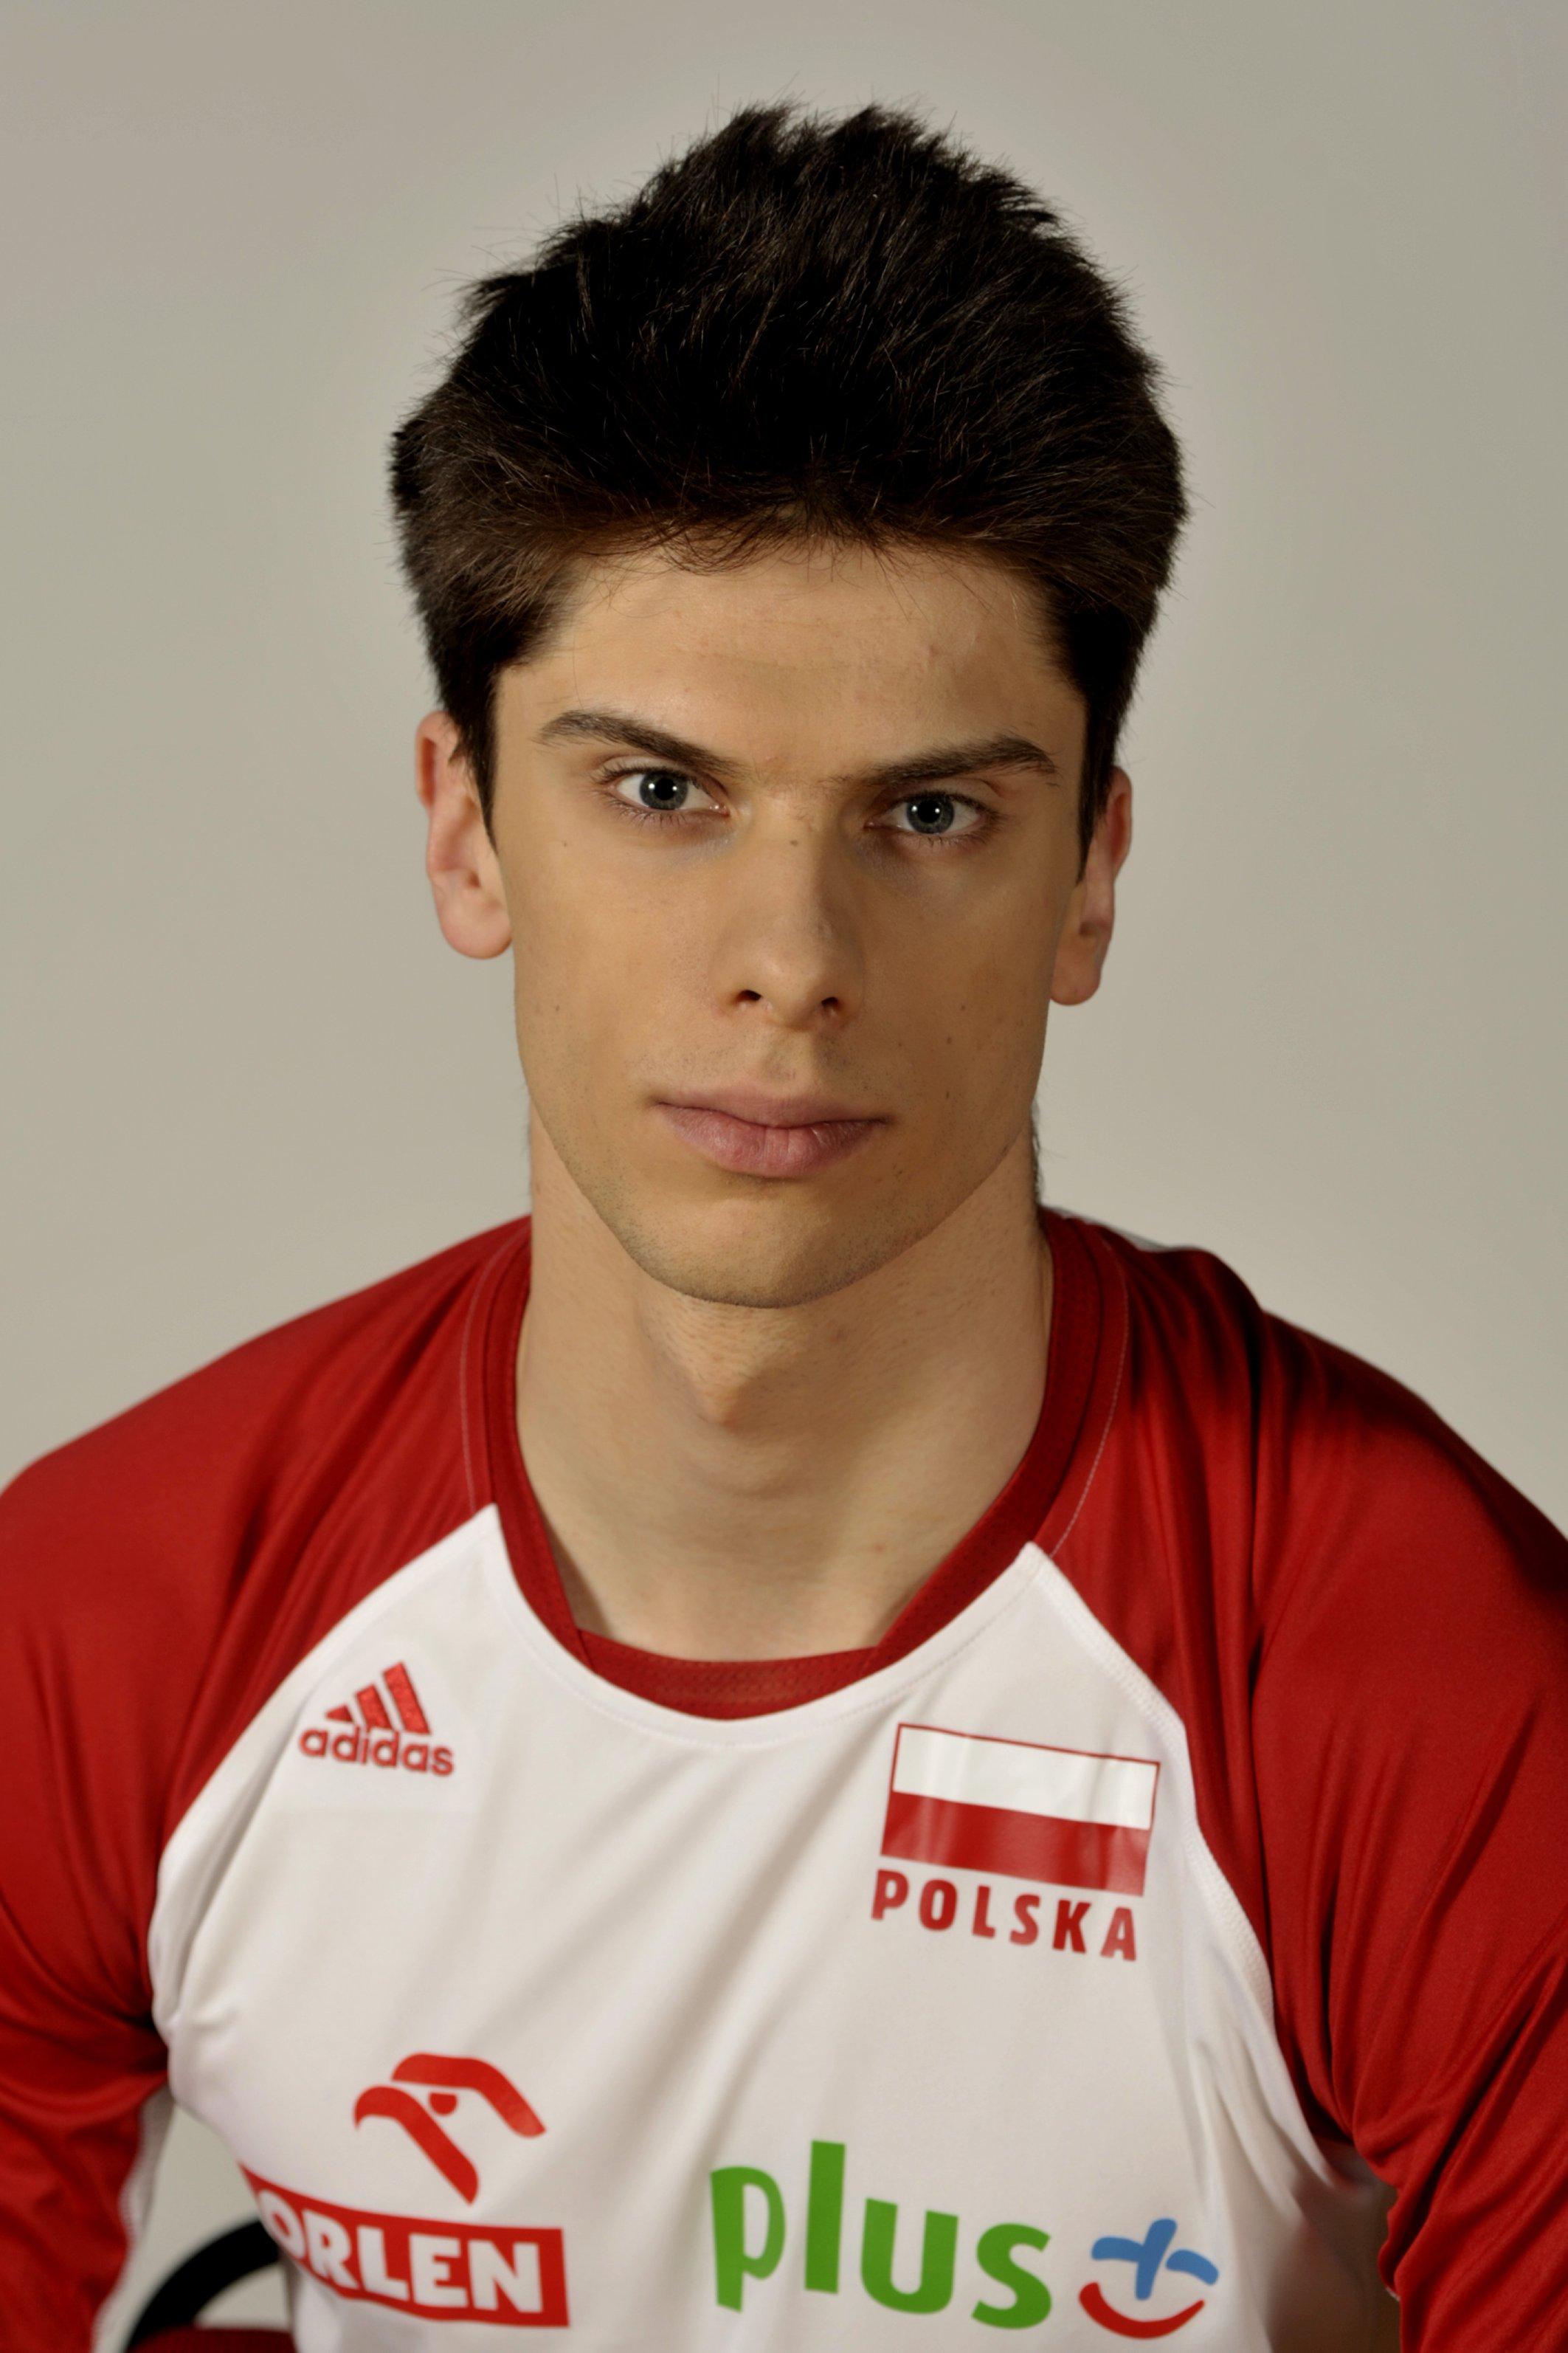 Aleksander Sliwka